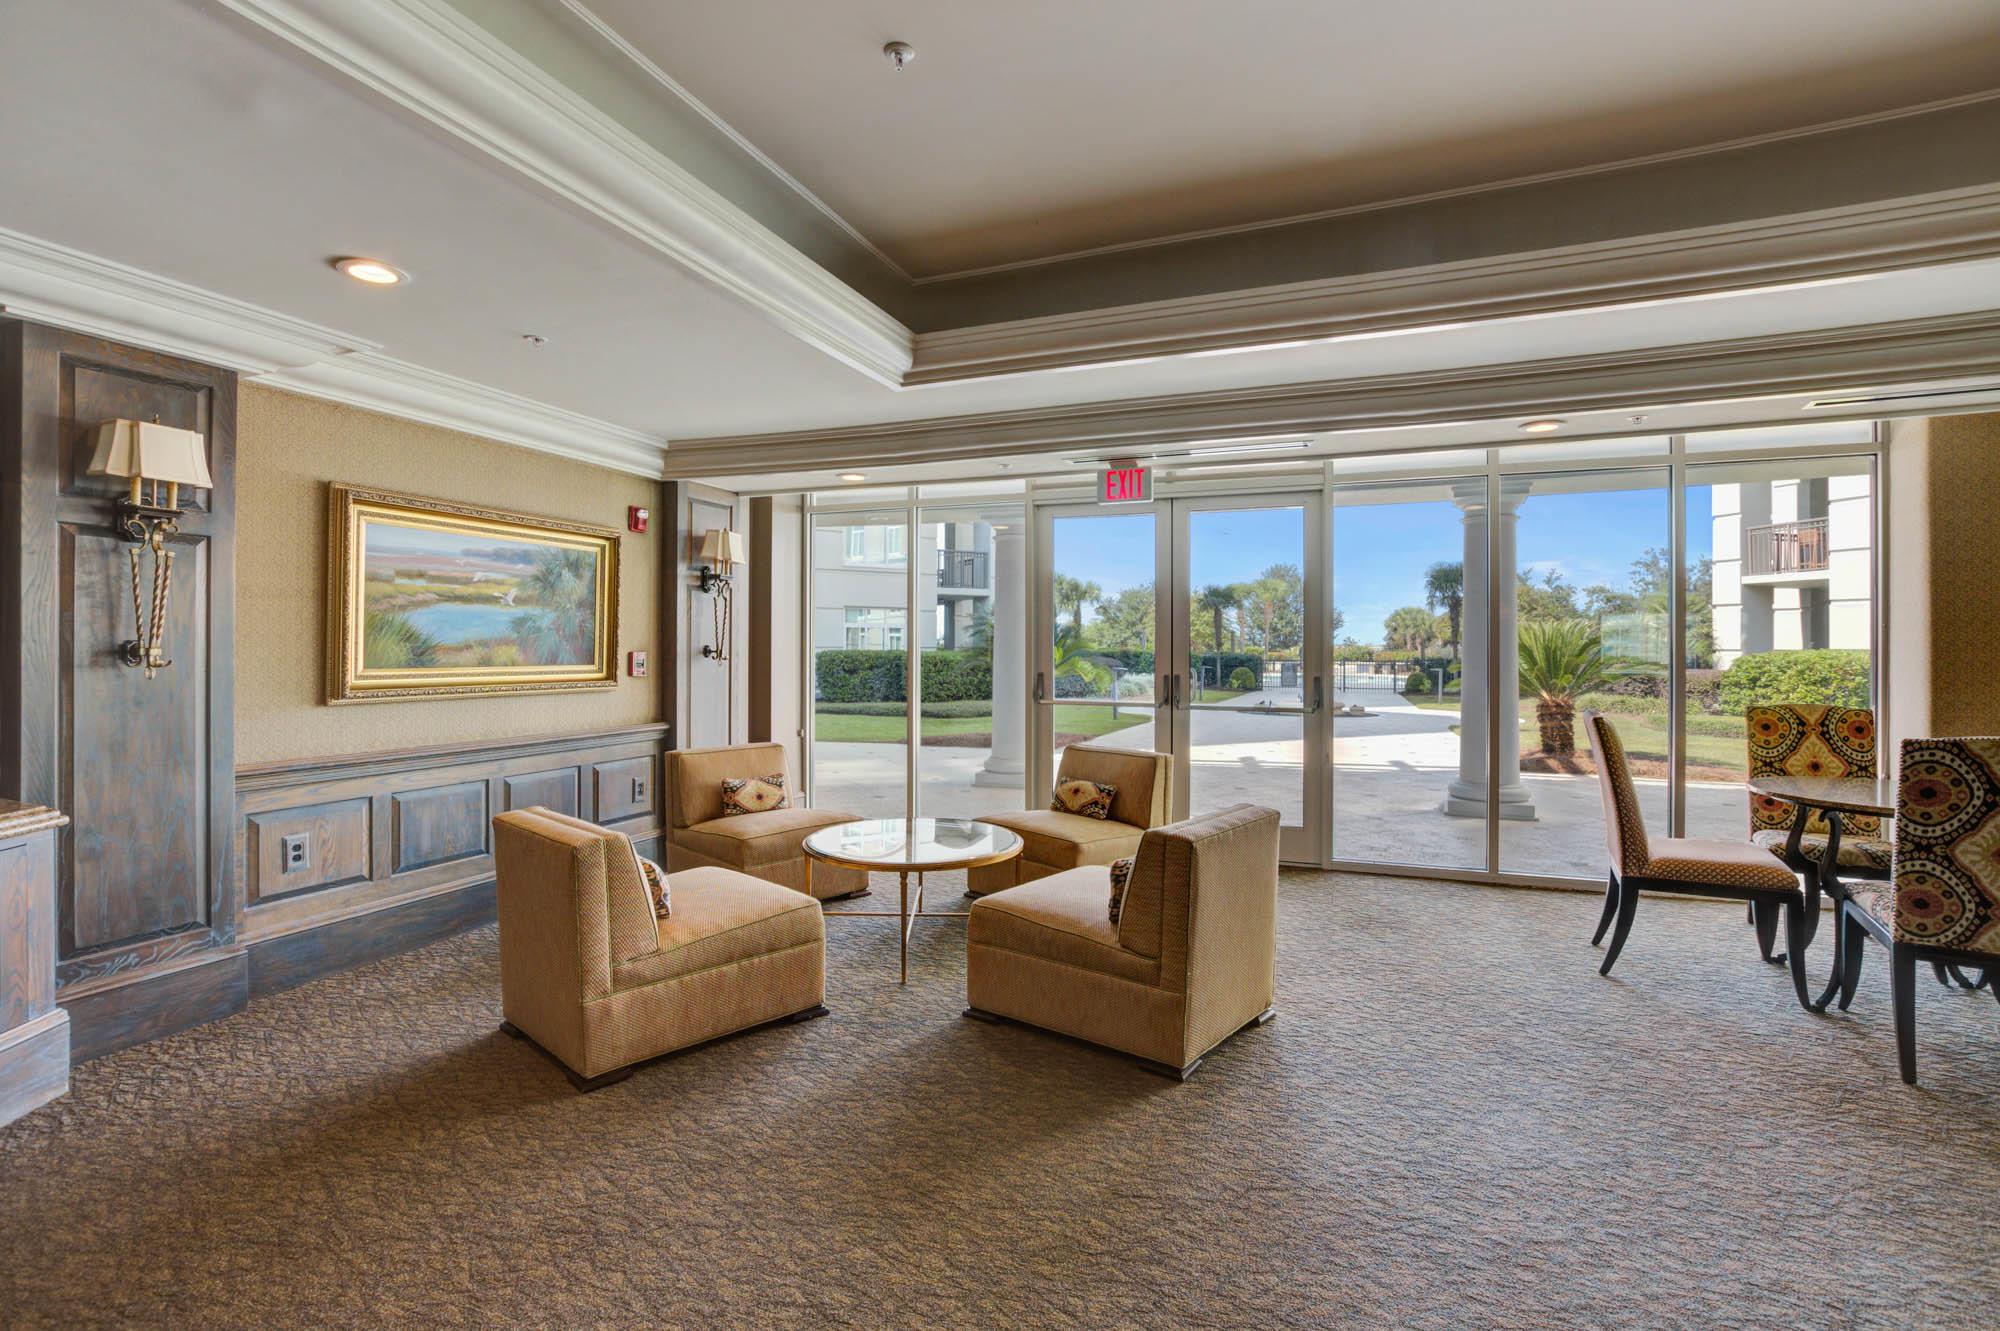 Renaissance On Chas Harbor Homes For Sale - 231 Plaza, Mount Pleasant, SC - 10